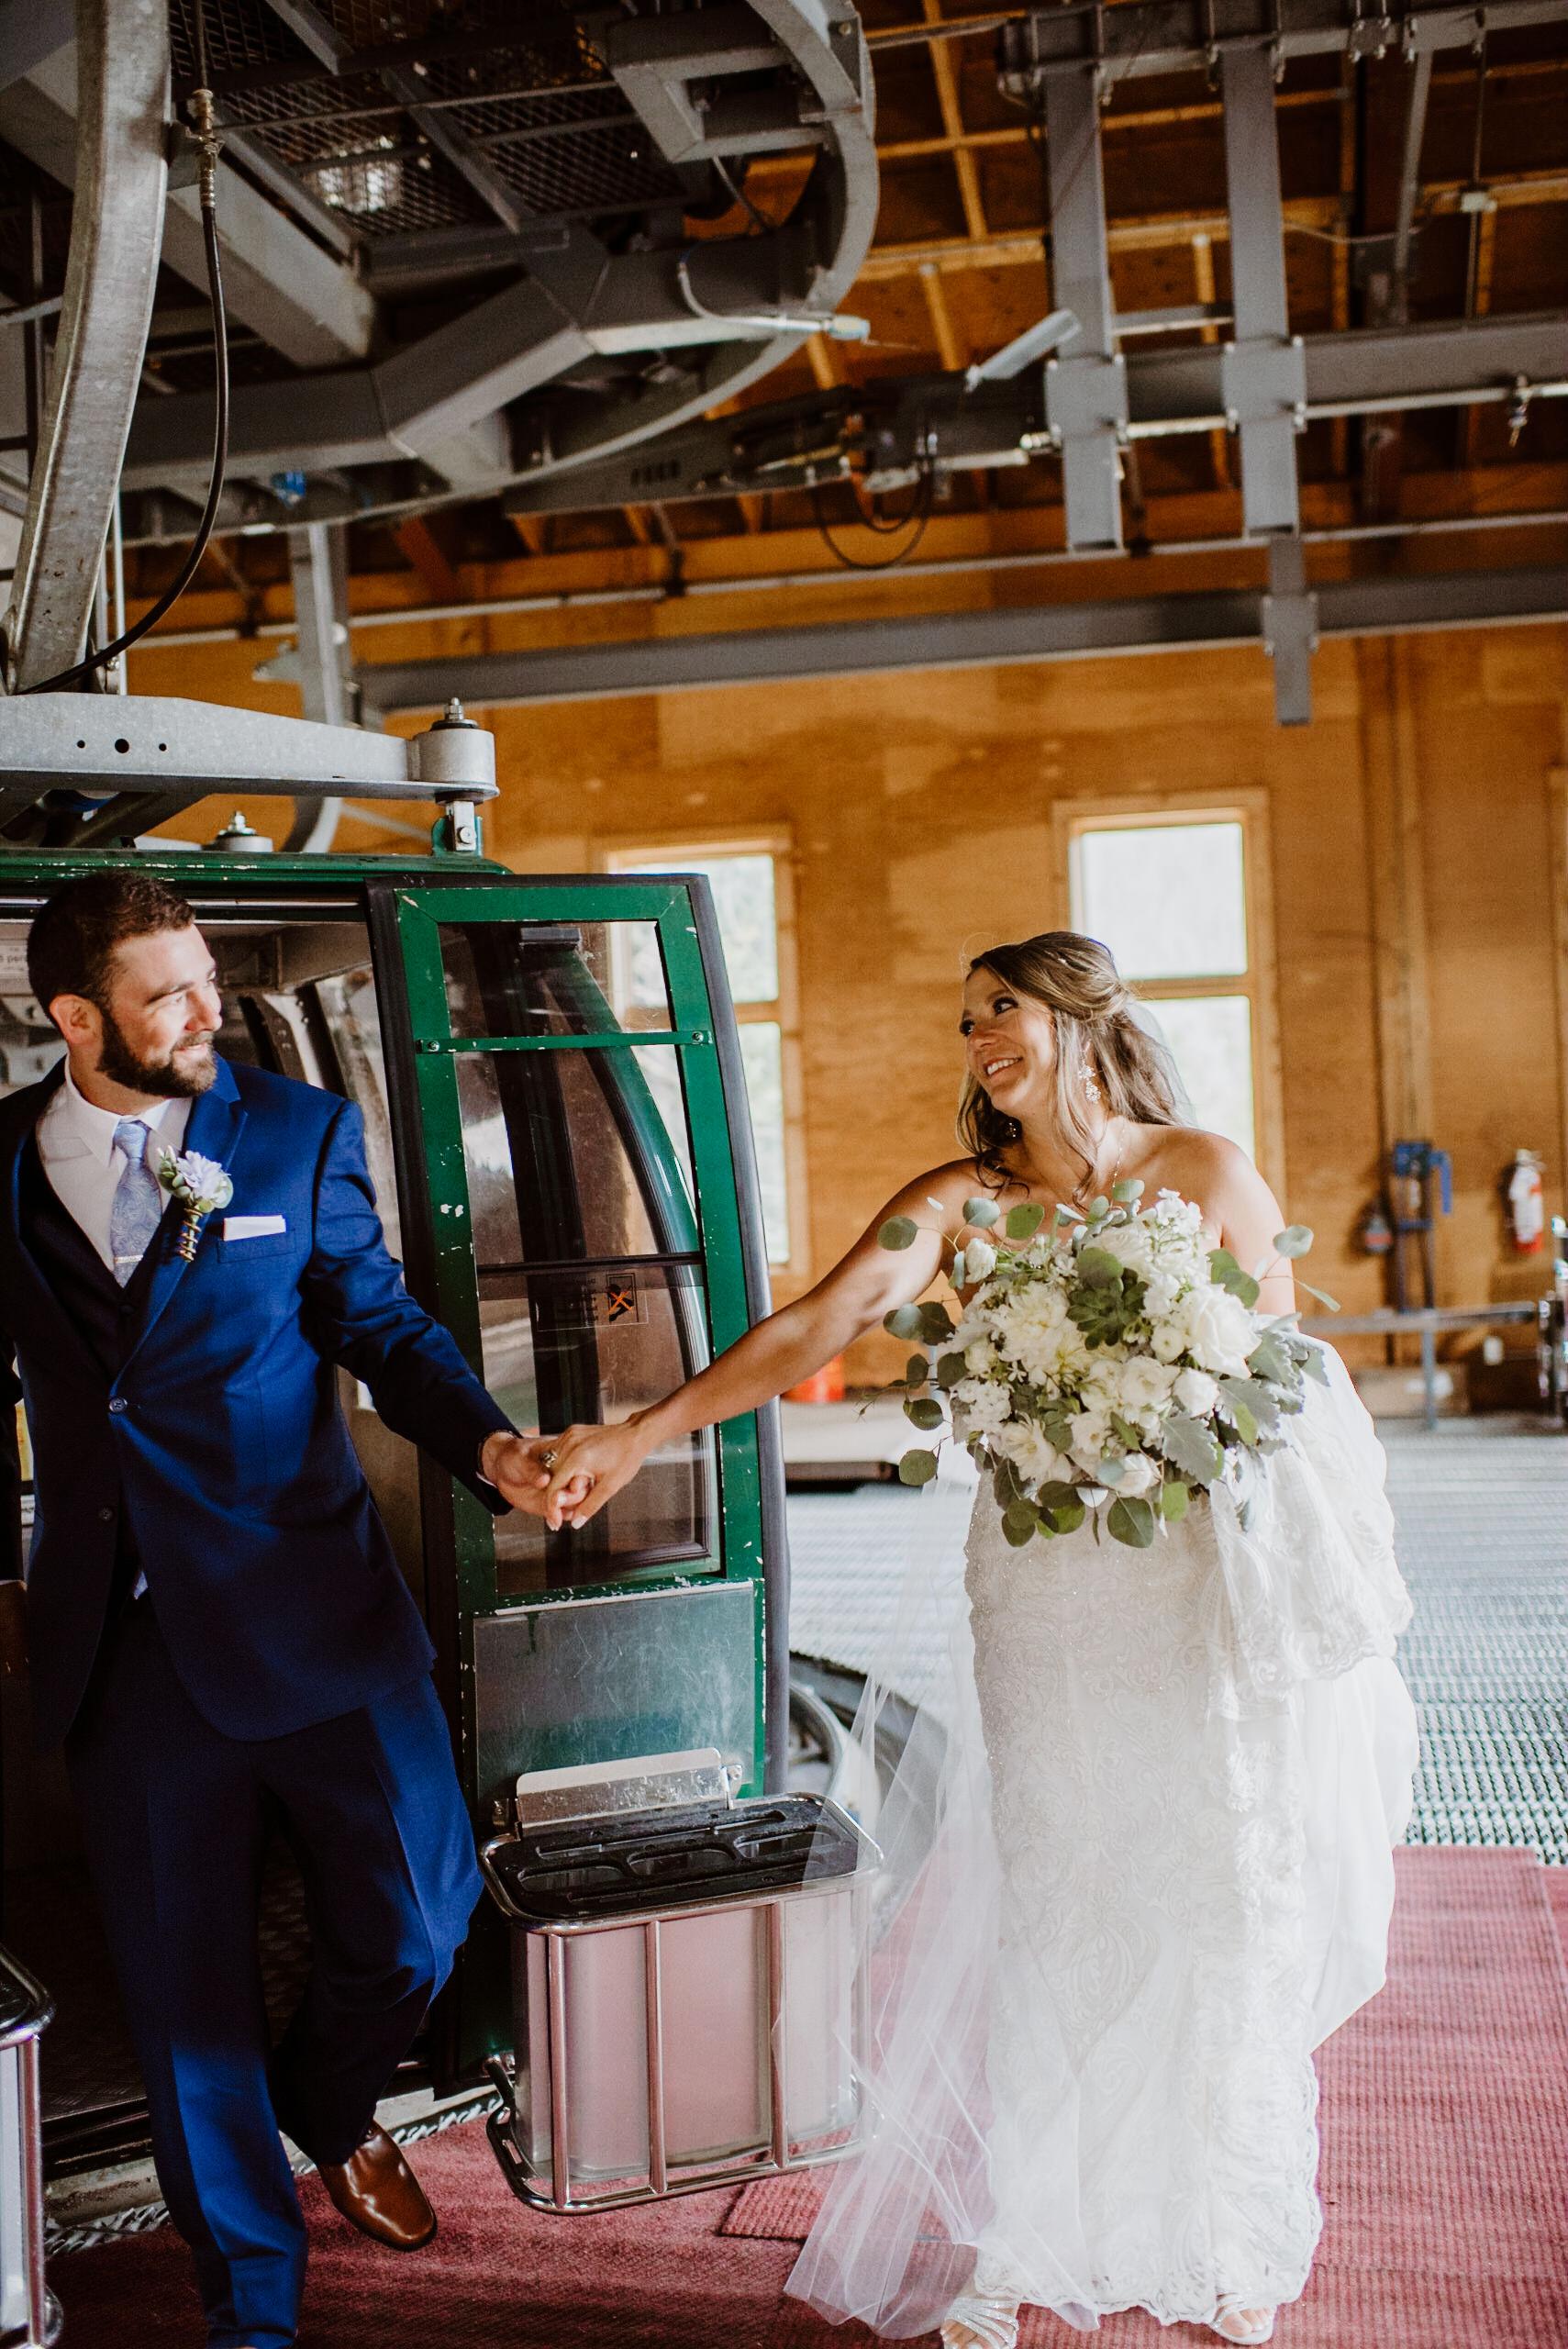 Bride and groom on gondola at Keystone, Colorado mountain wedding